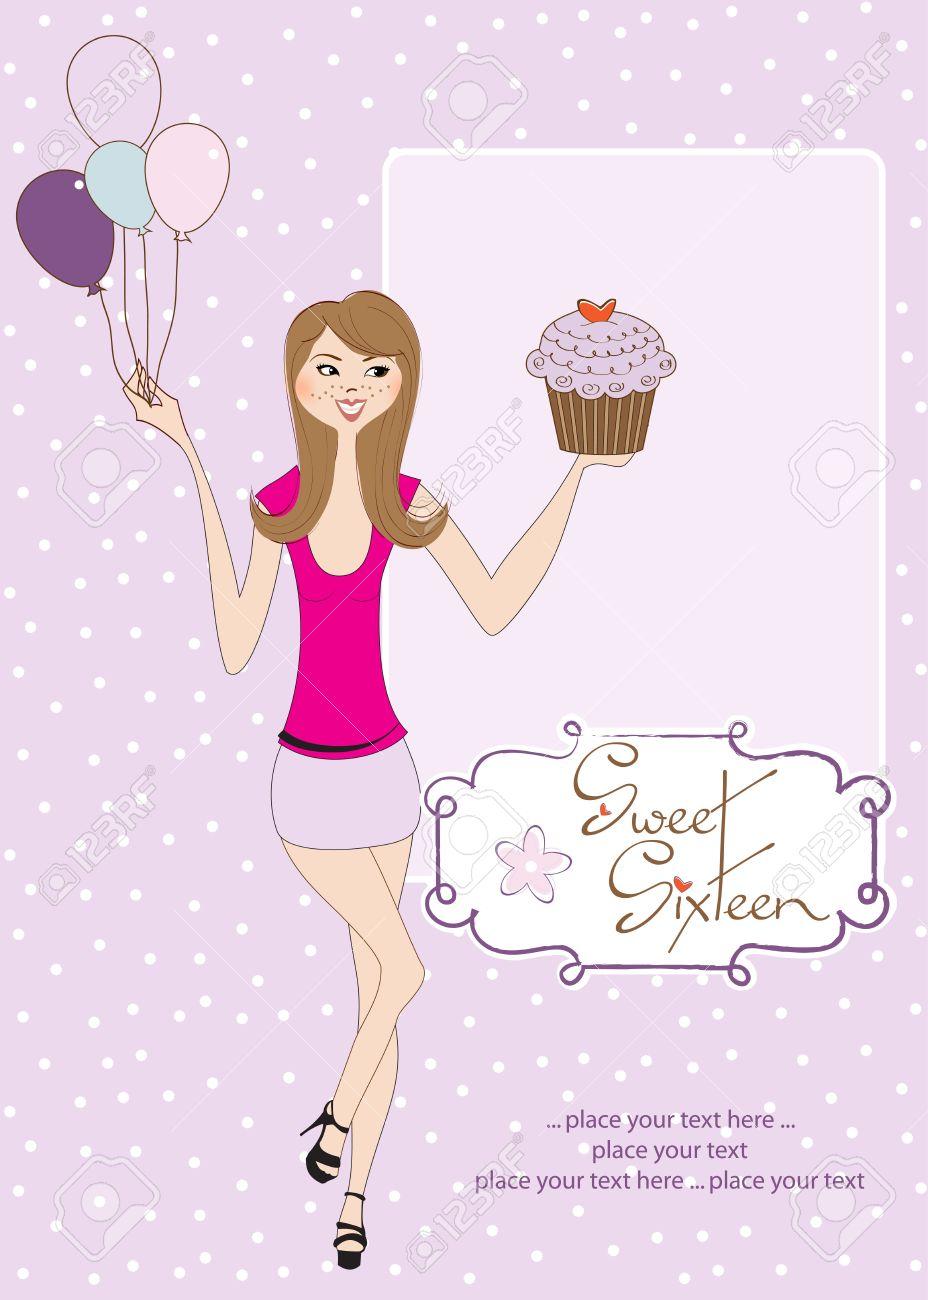 Sweet Sixteen Birthday Cards gangcraftnet – Sweet Sixteen Birthday Greetings